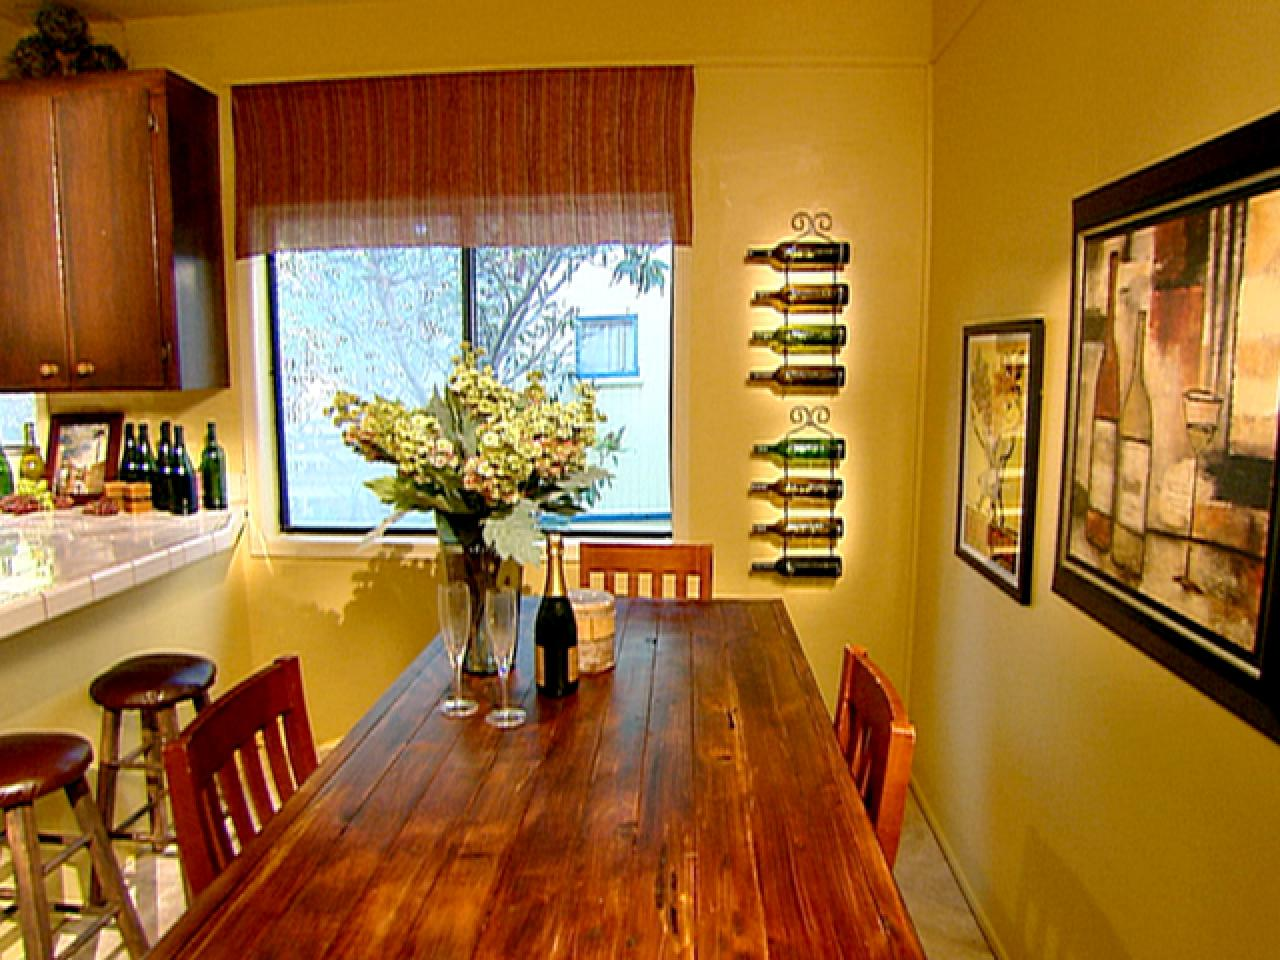 Hdmix501 Aft1 Kitchenafter Wine Themed Kitchen 1280x960 Wallpaper Teahub Io